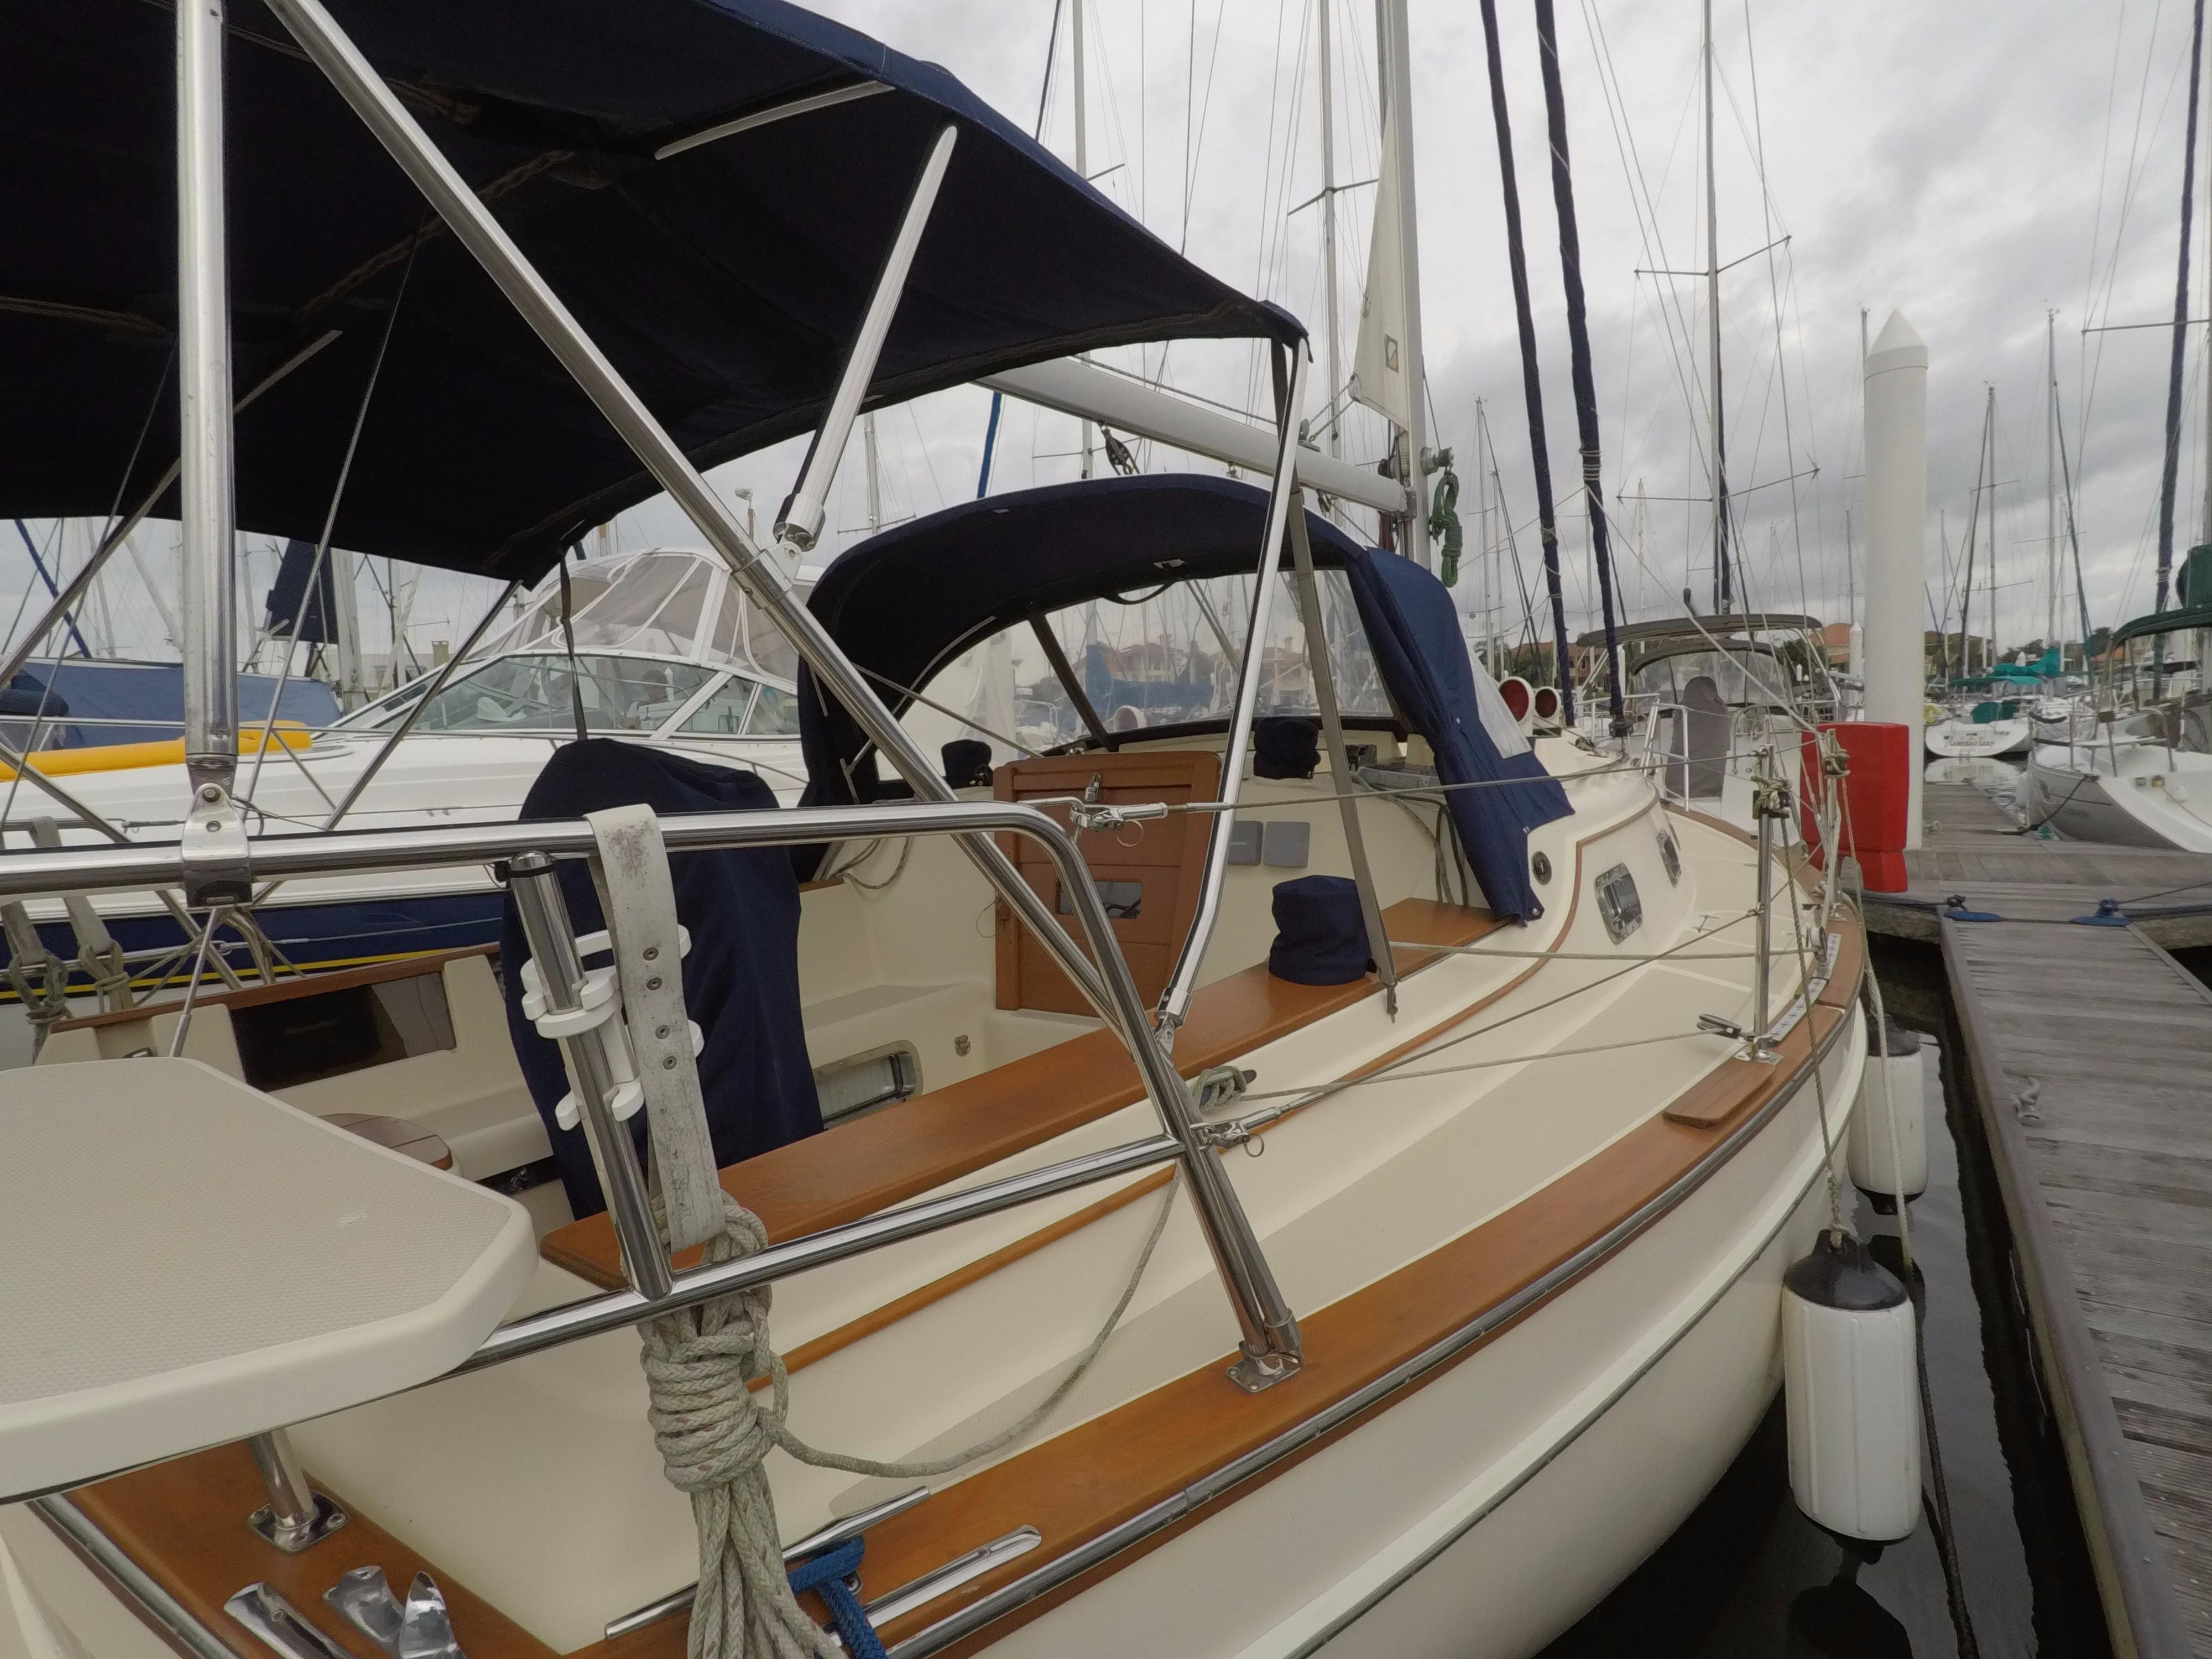 2000 Island Packet 320 – Little Yacht Sales